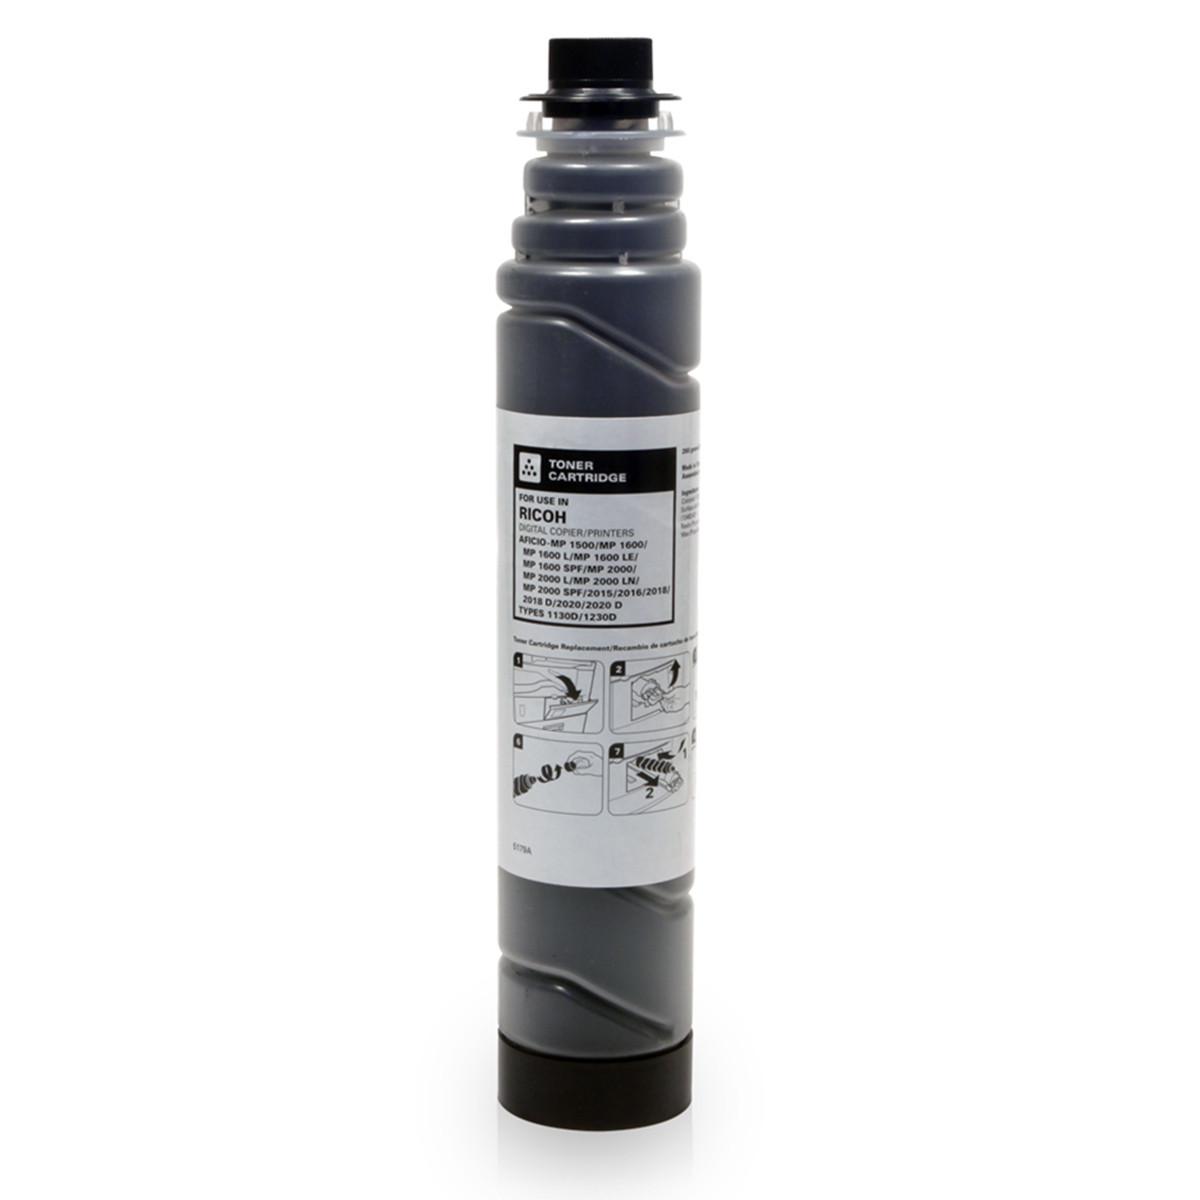 Toner Ricoh Aficio 1130D | 2000 2018 2020D 2015 2018D 2016 2020 MP1500 MP1600 | Katun Performance